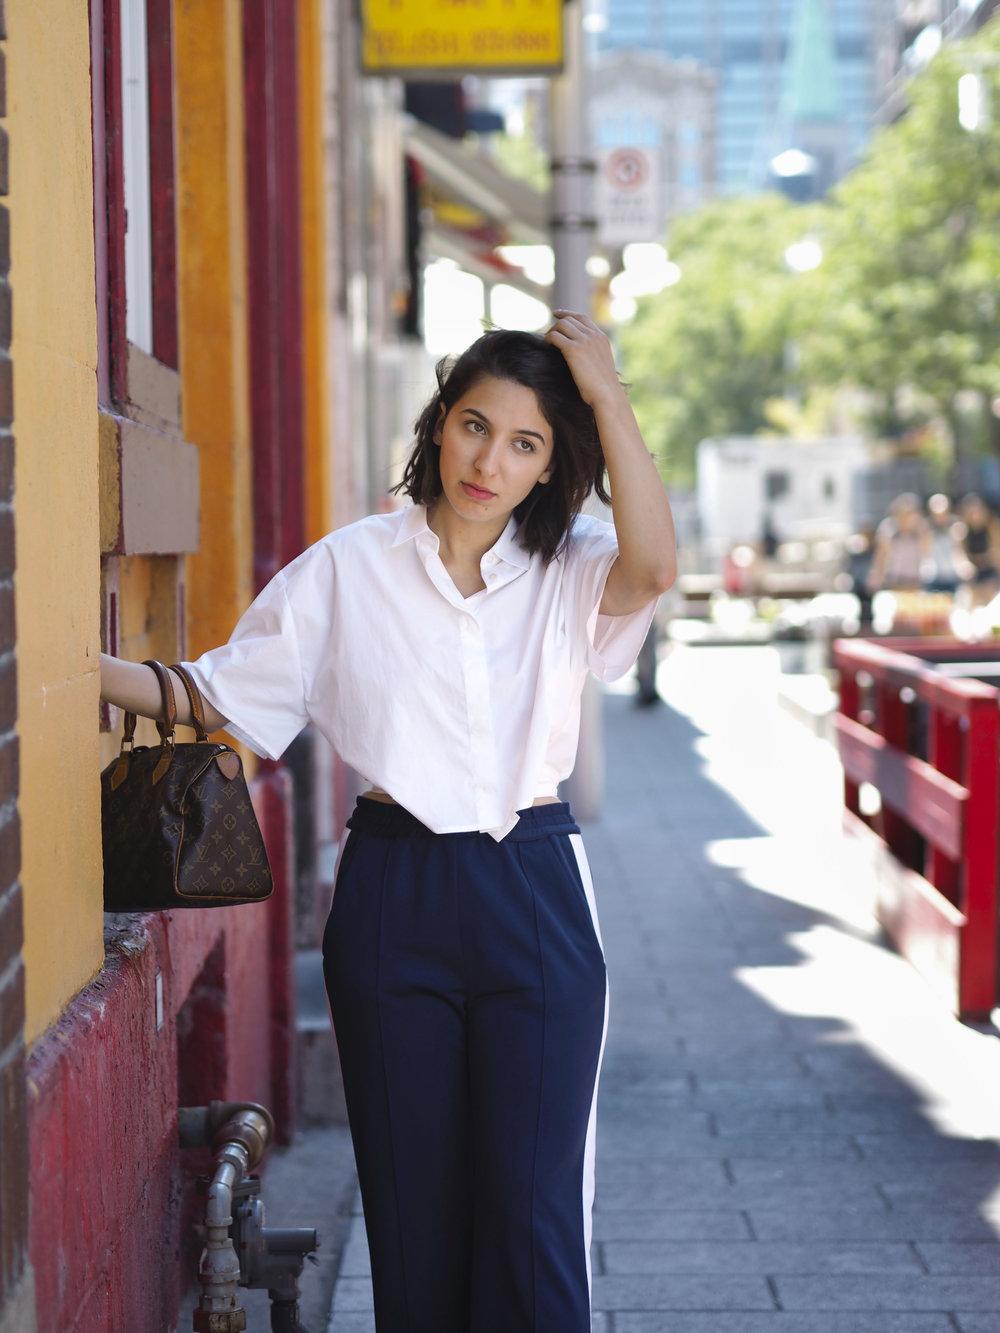 MSGM Shirt and Pants, Louis Vuitton Bag, Zara Shoes